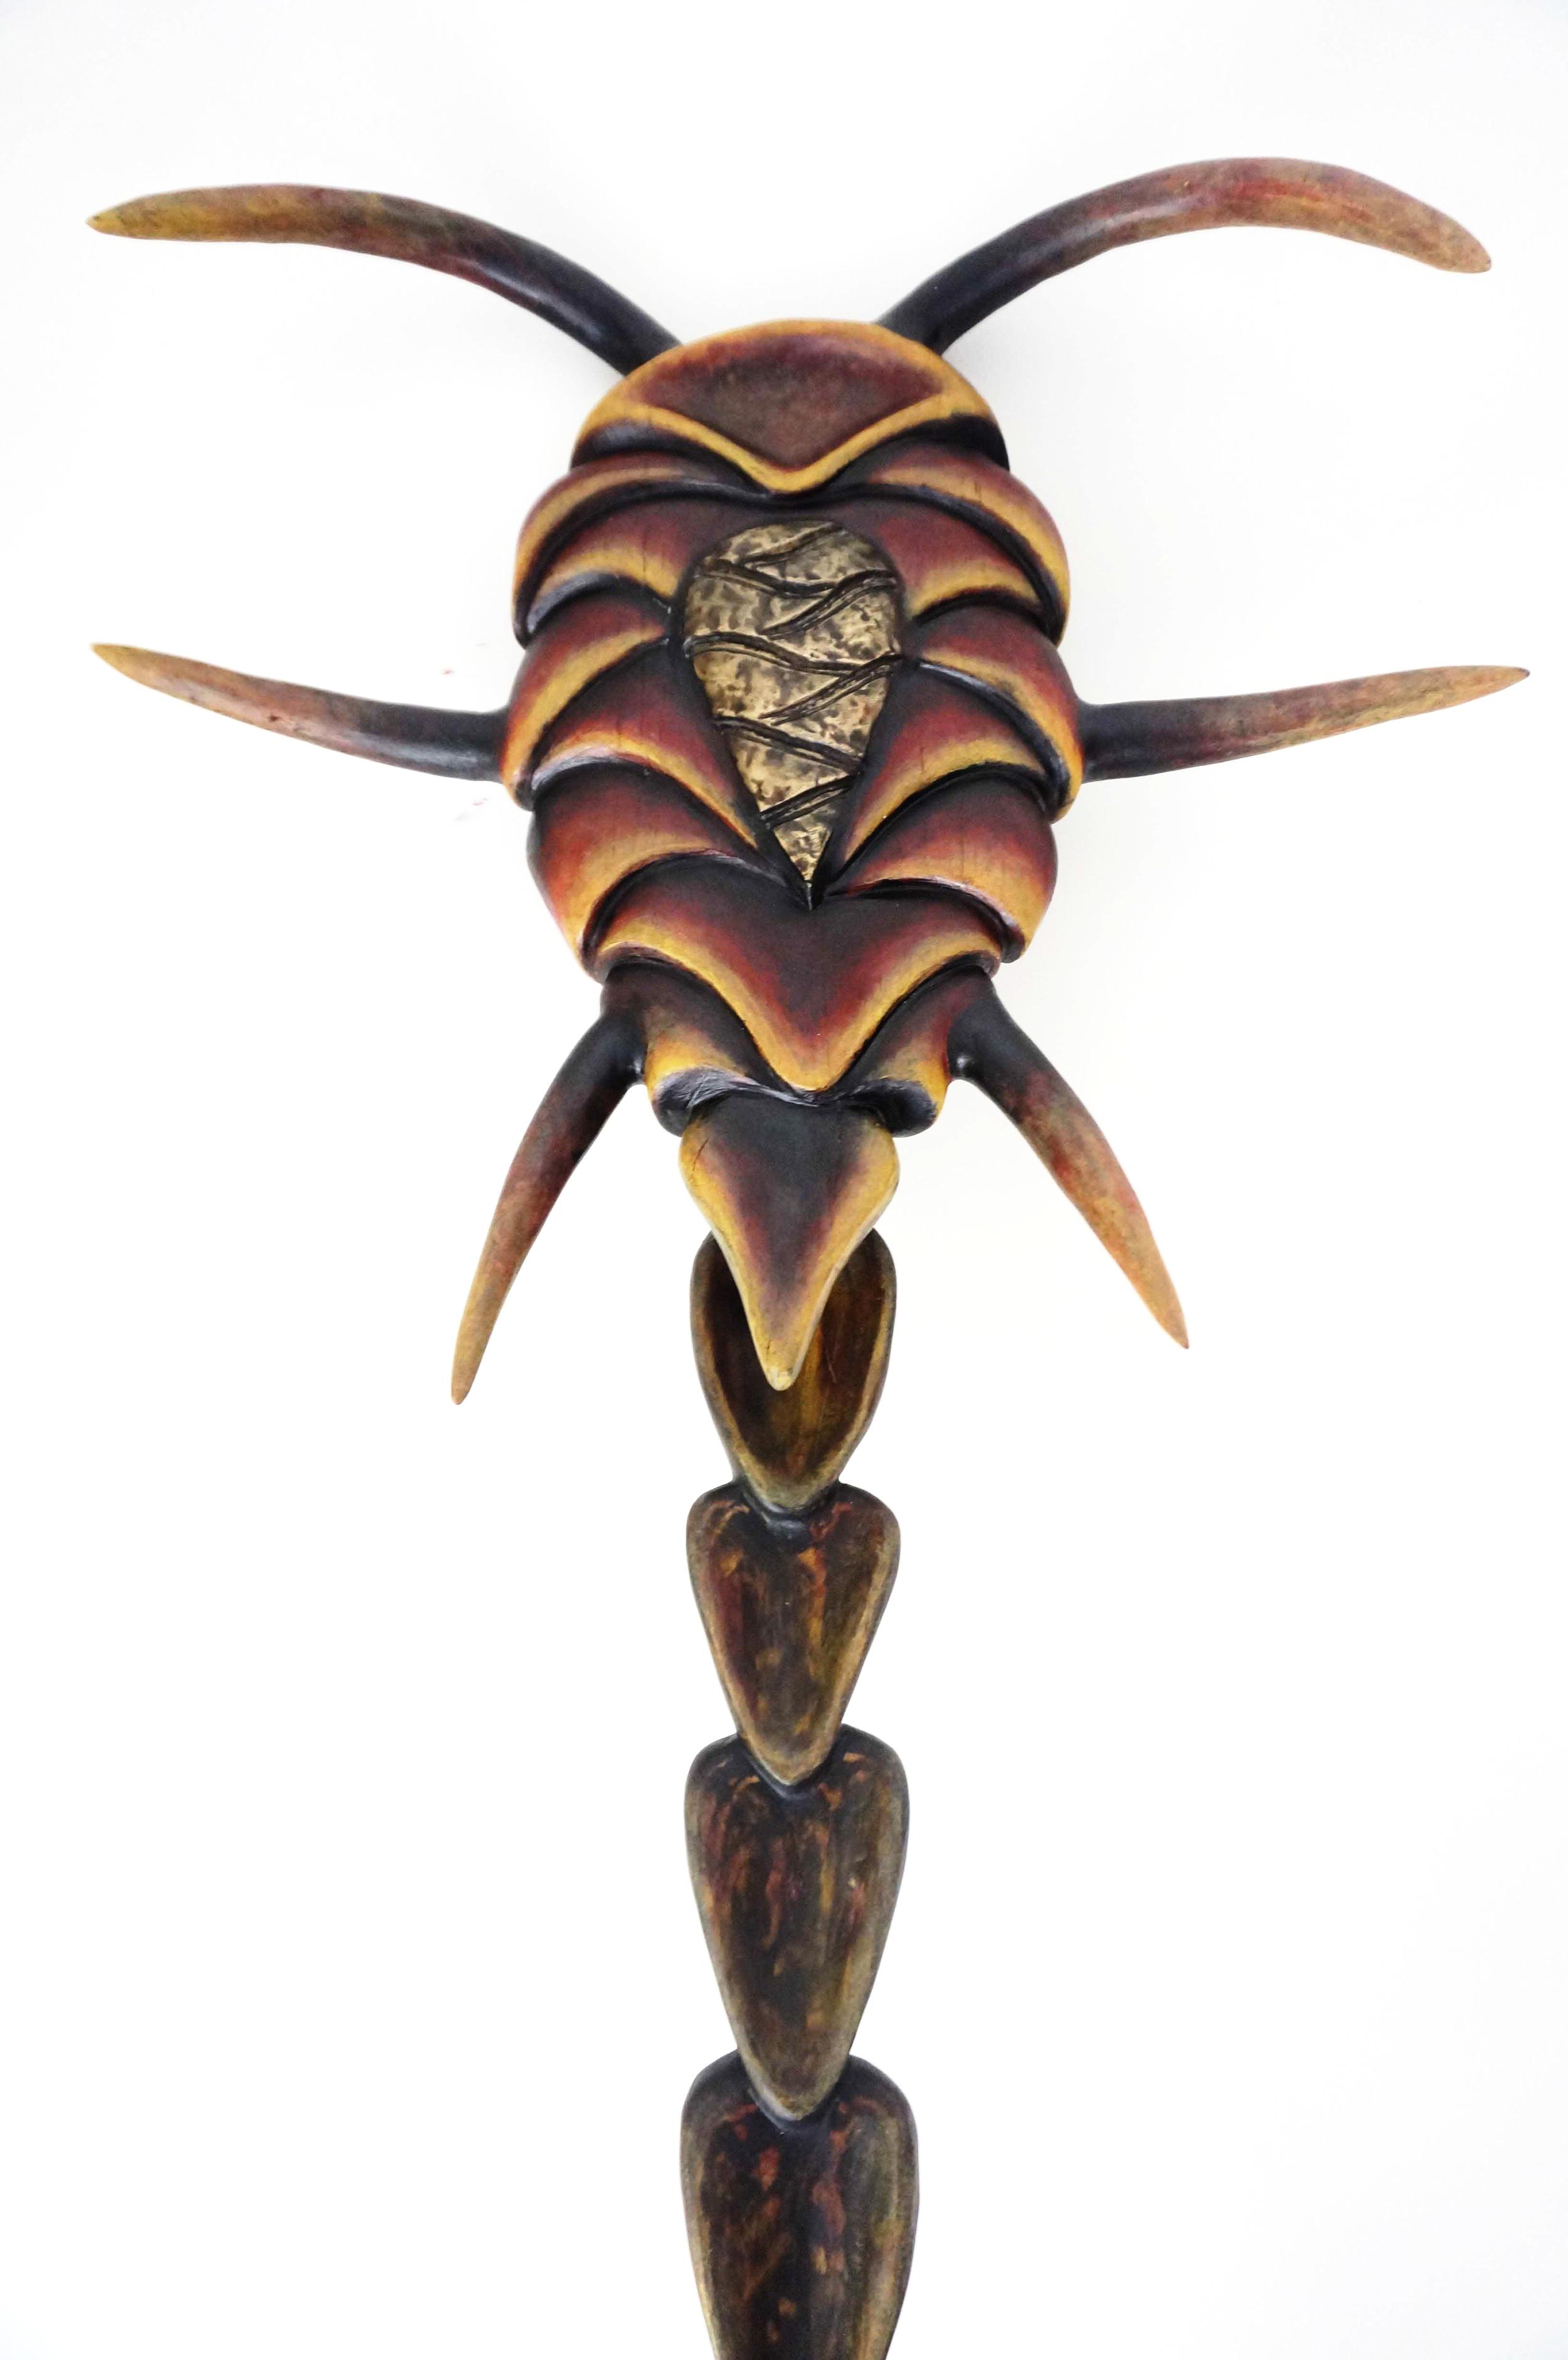 Carapace(artefact).JPG